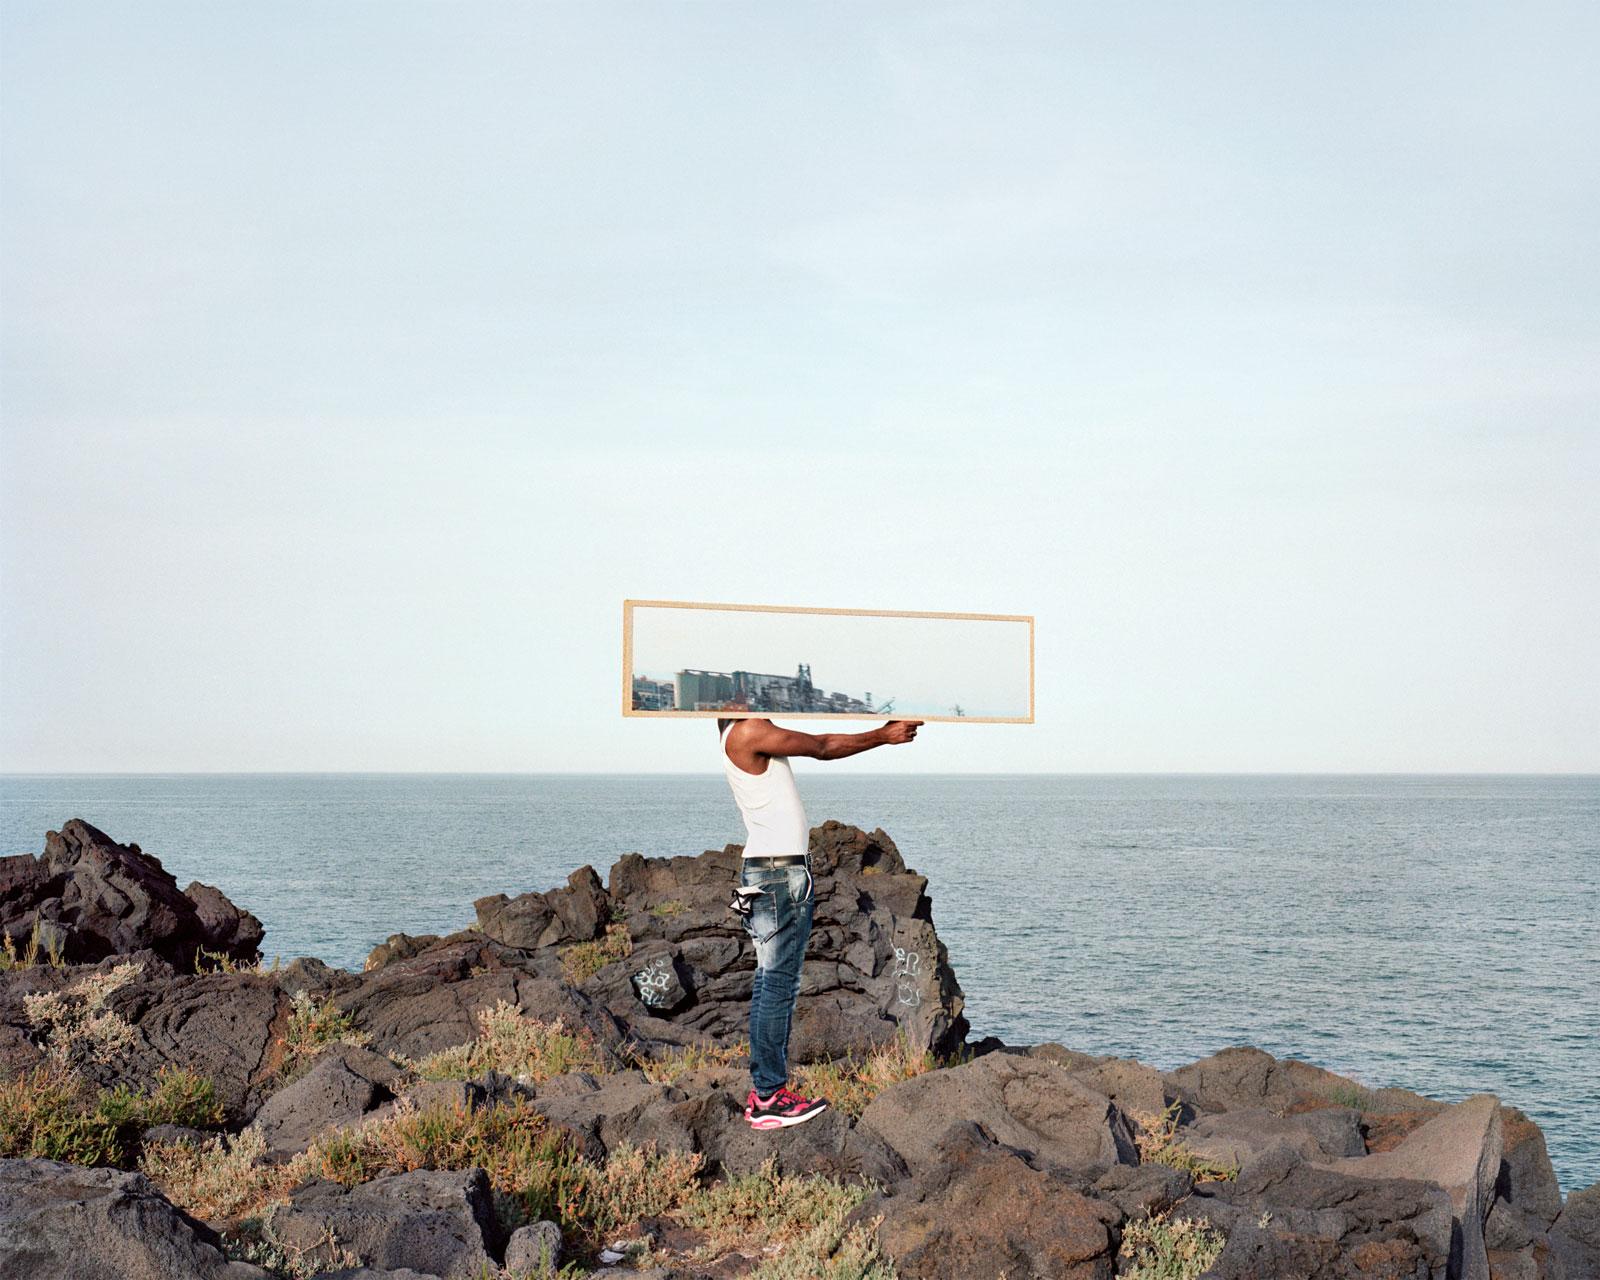 Dawit L. Petros's 12.Untitled (Epilogue II), Catania, Italy